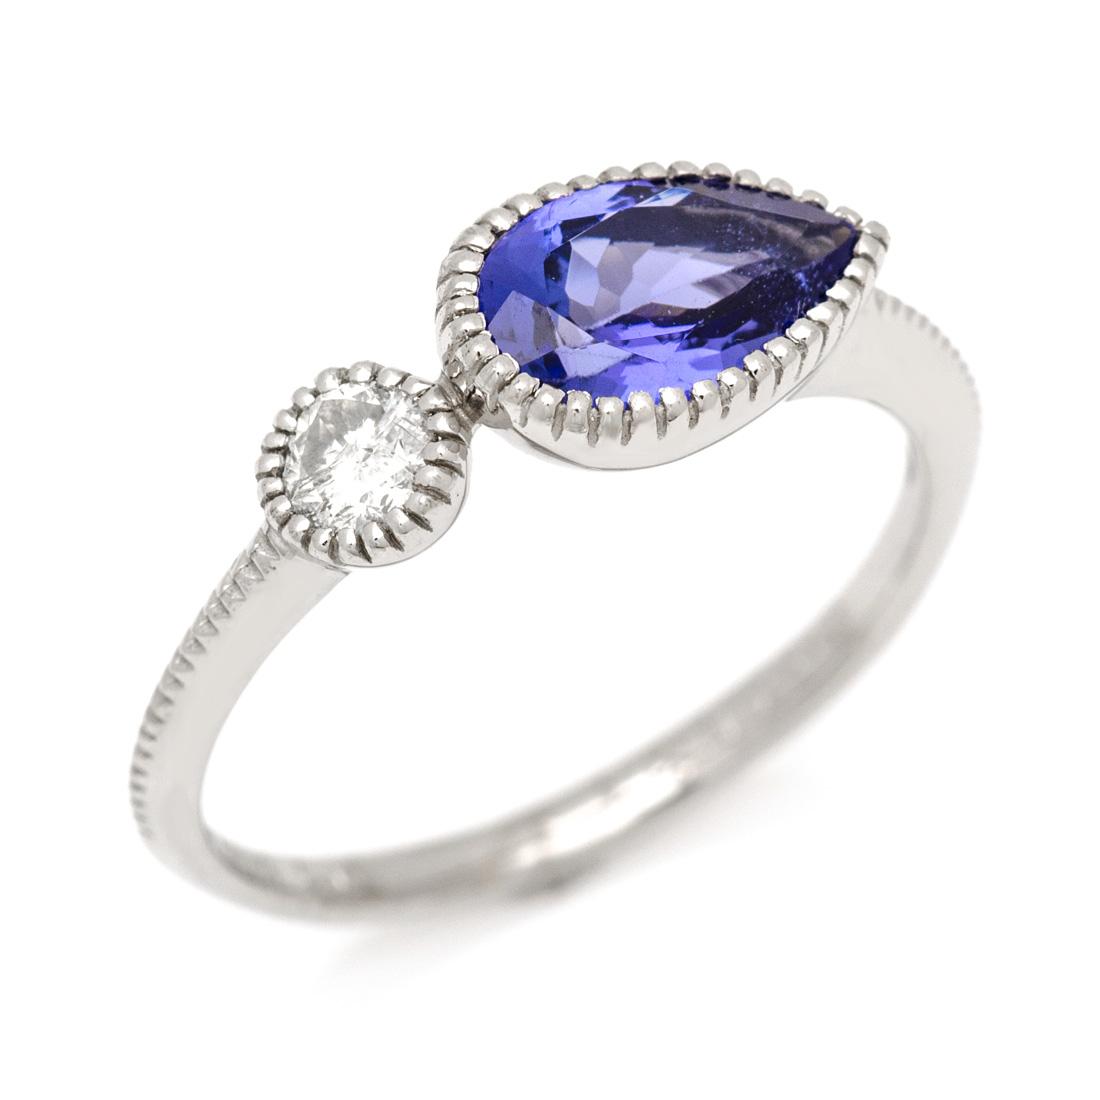 K18 タンザナイト ダイヤモンド リング 「pianto」送料無料 指輪 ゴールド 18K 18金 ブルーゾイサイト ダイアモンド 誕生日 12月誕生石 刻印 文字入れ メッセージ ギフト 贈り物 ピンキーリング対応可能